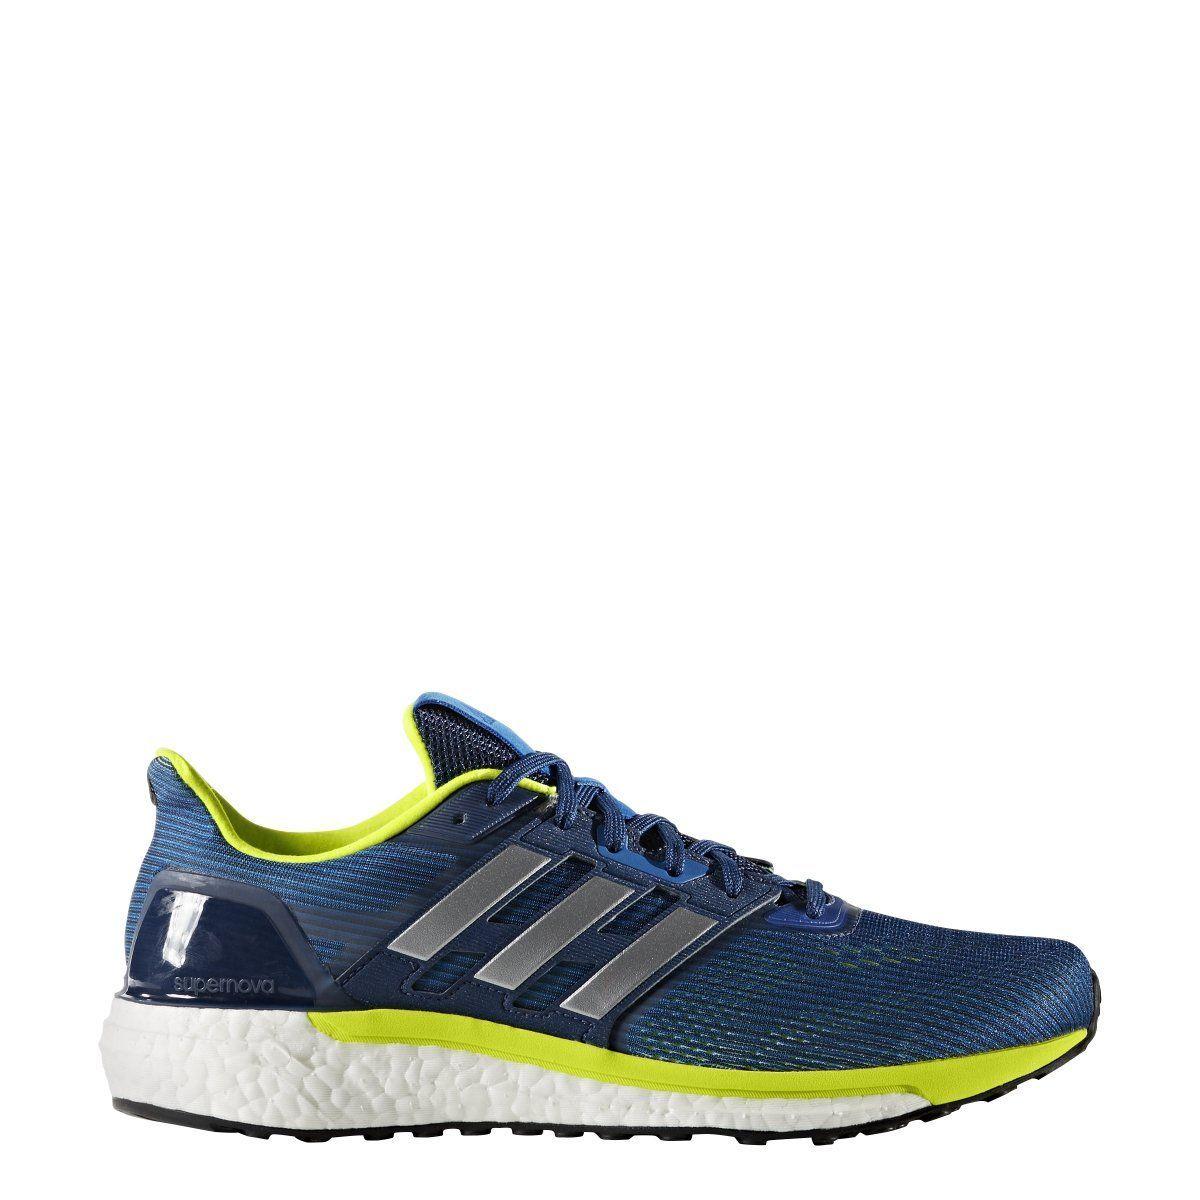 Chaussures Adidas Supernova heS0J